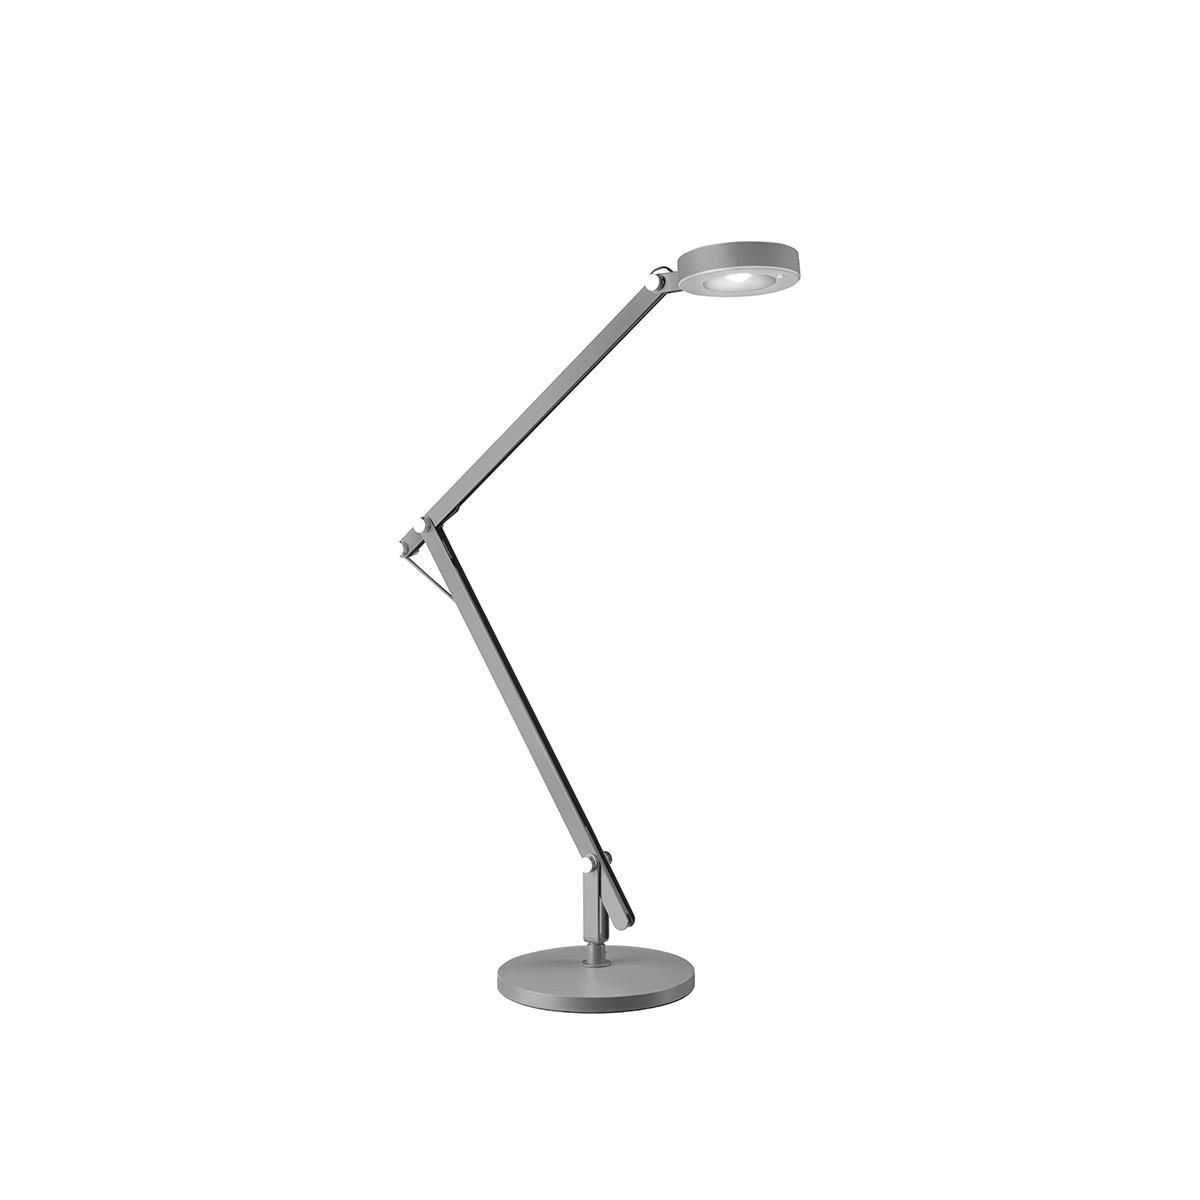 Sompex Sting LED Tischleuchte, grau